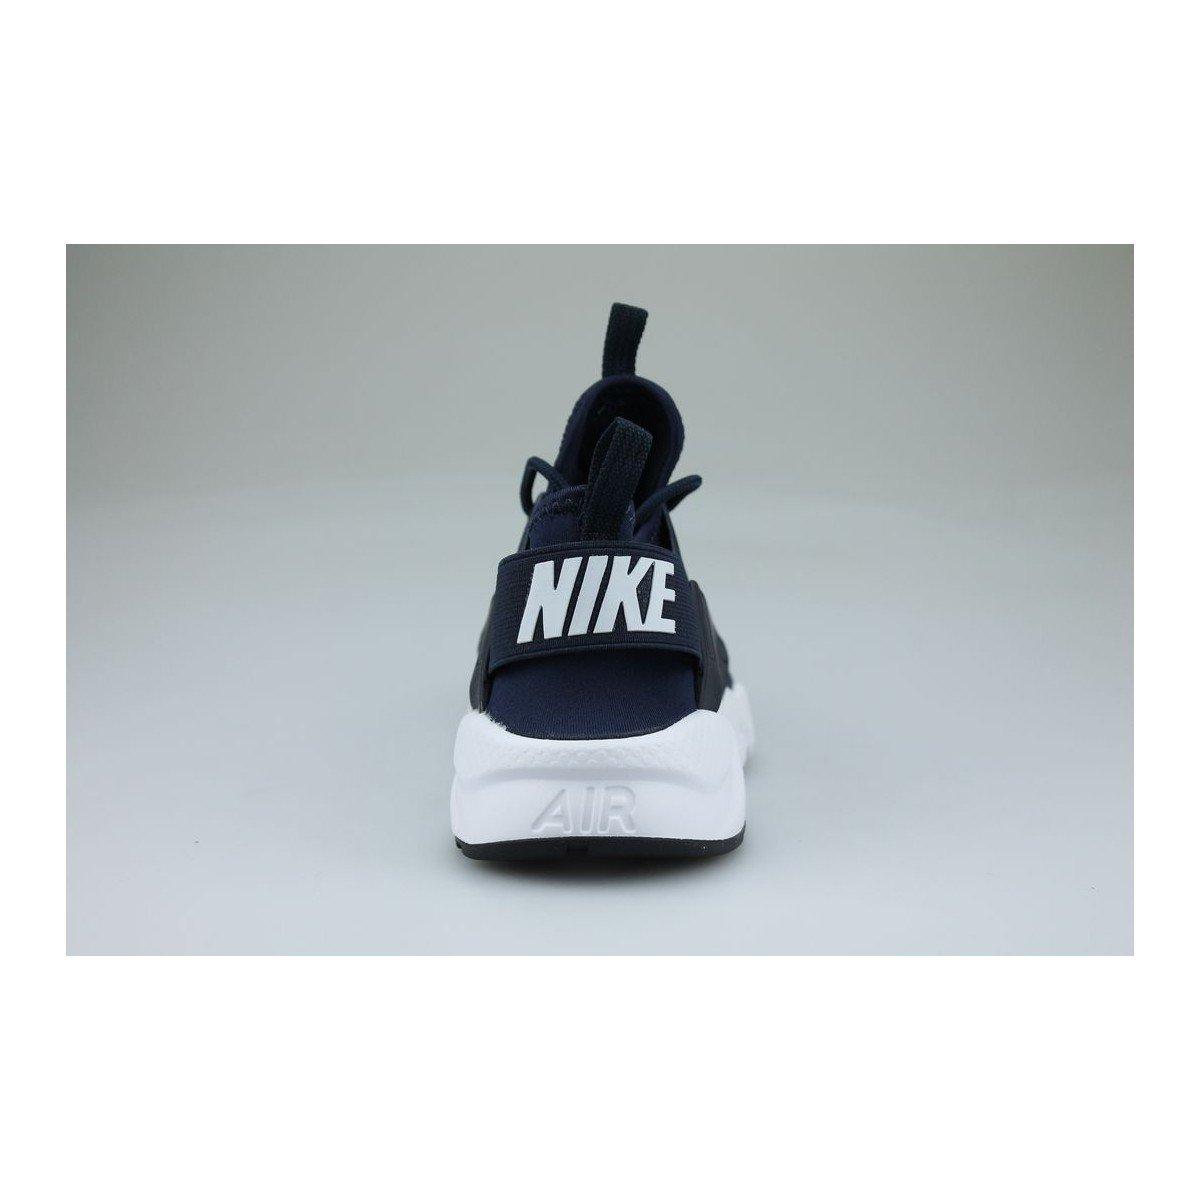 Nike Air Huarache Ultra (GS) Sneaker Kids Trainers Boots, Dunkelblau  (Obsidian/White/Black), 40 EU: Amazon.co.uk: Sports & Outdoors